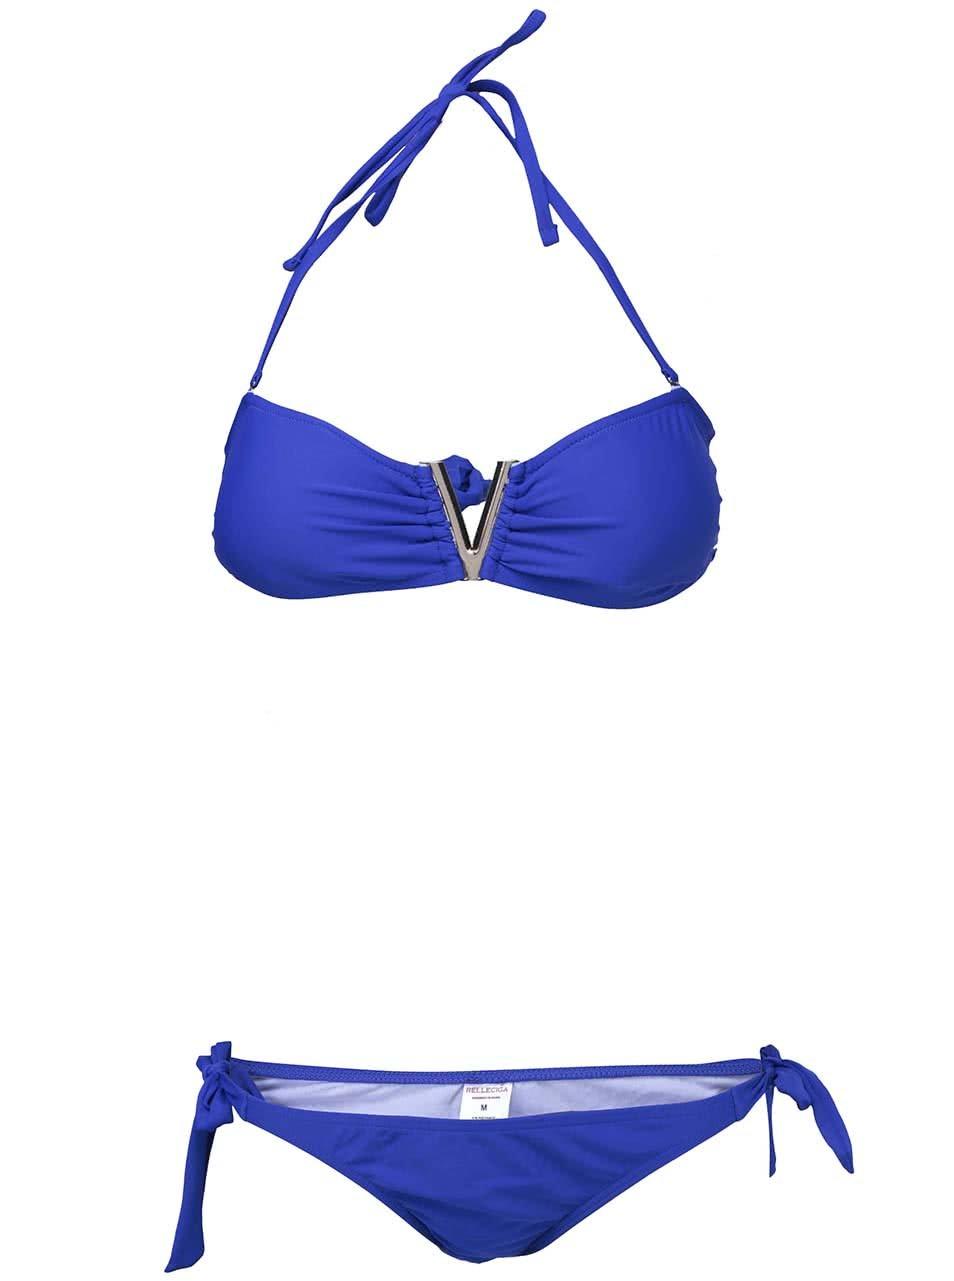 Modré plavky s kovovým detailem Relleciga Bronze